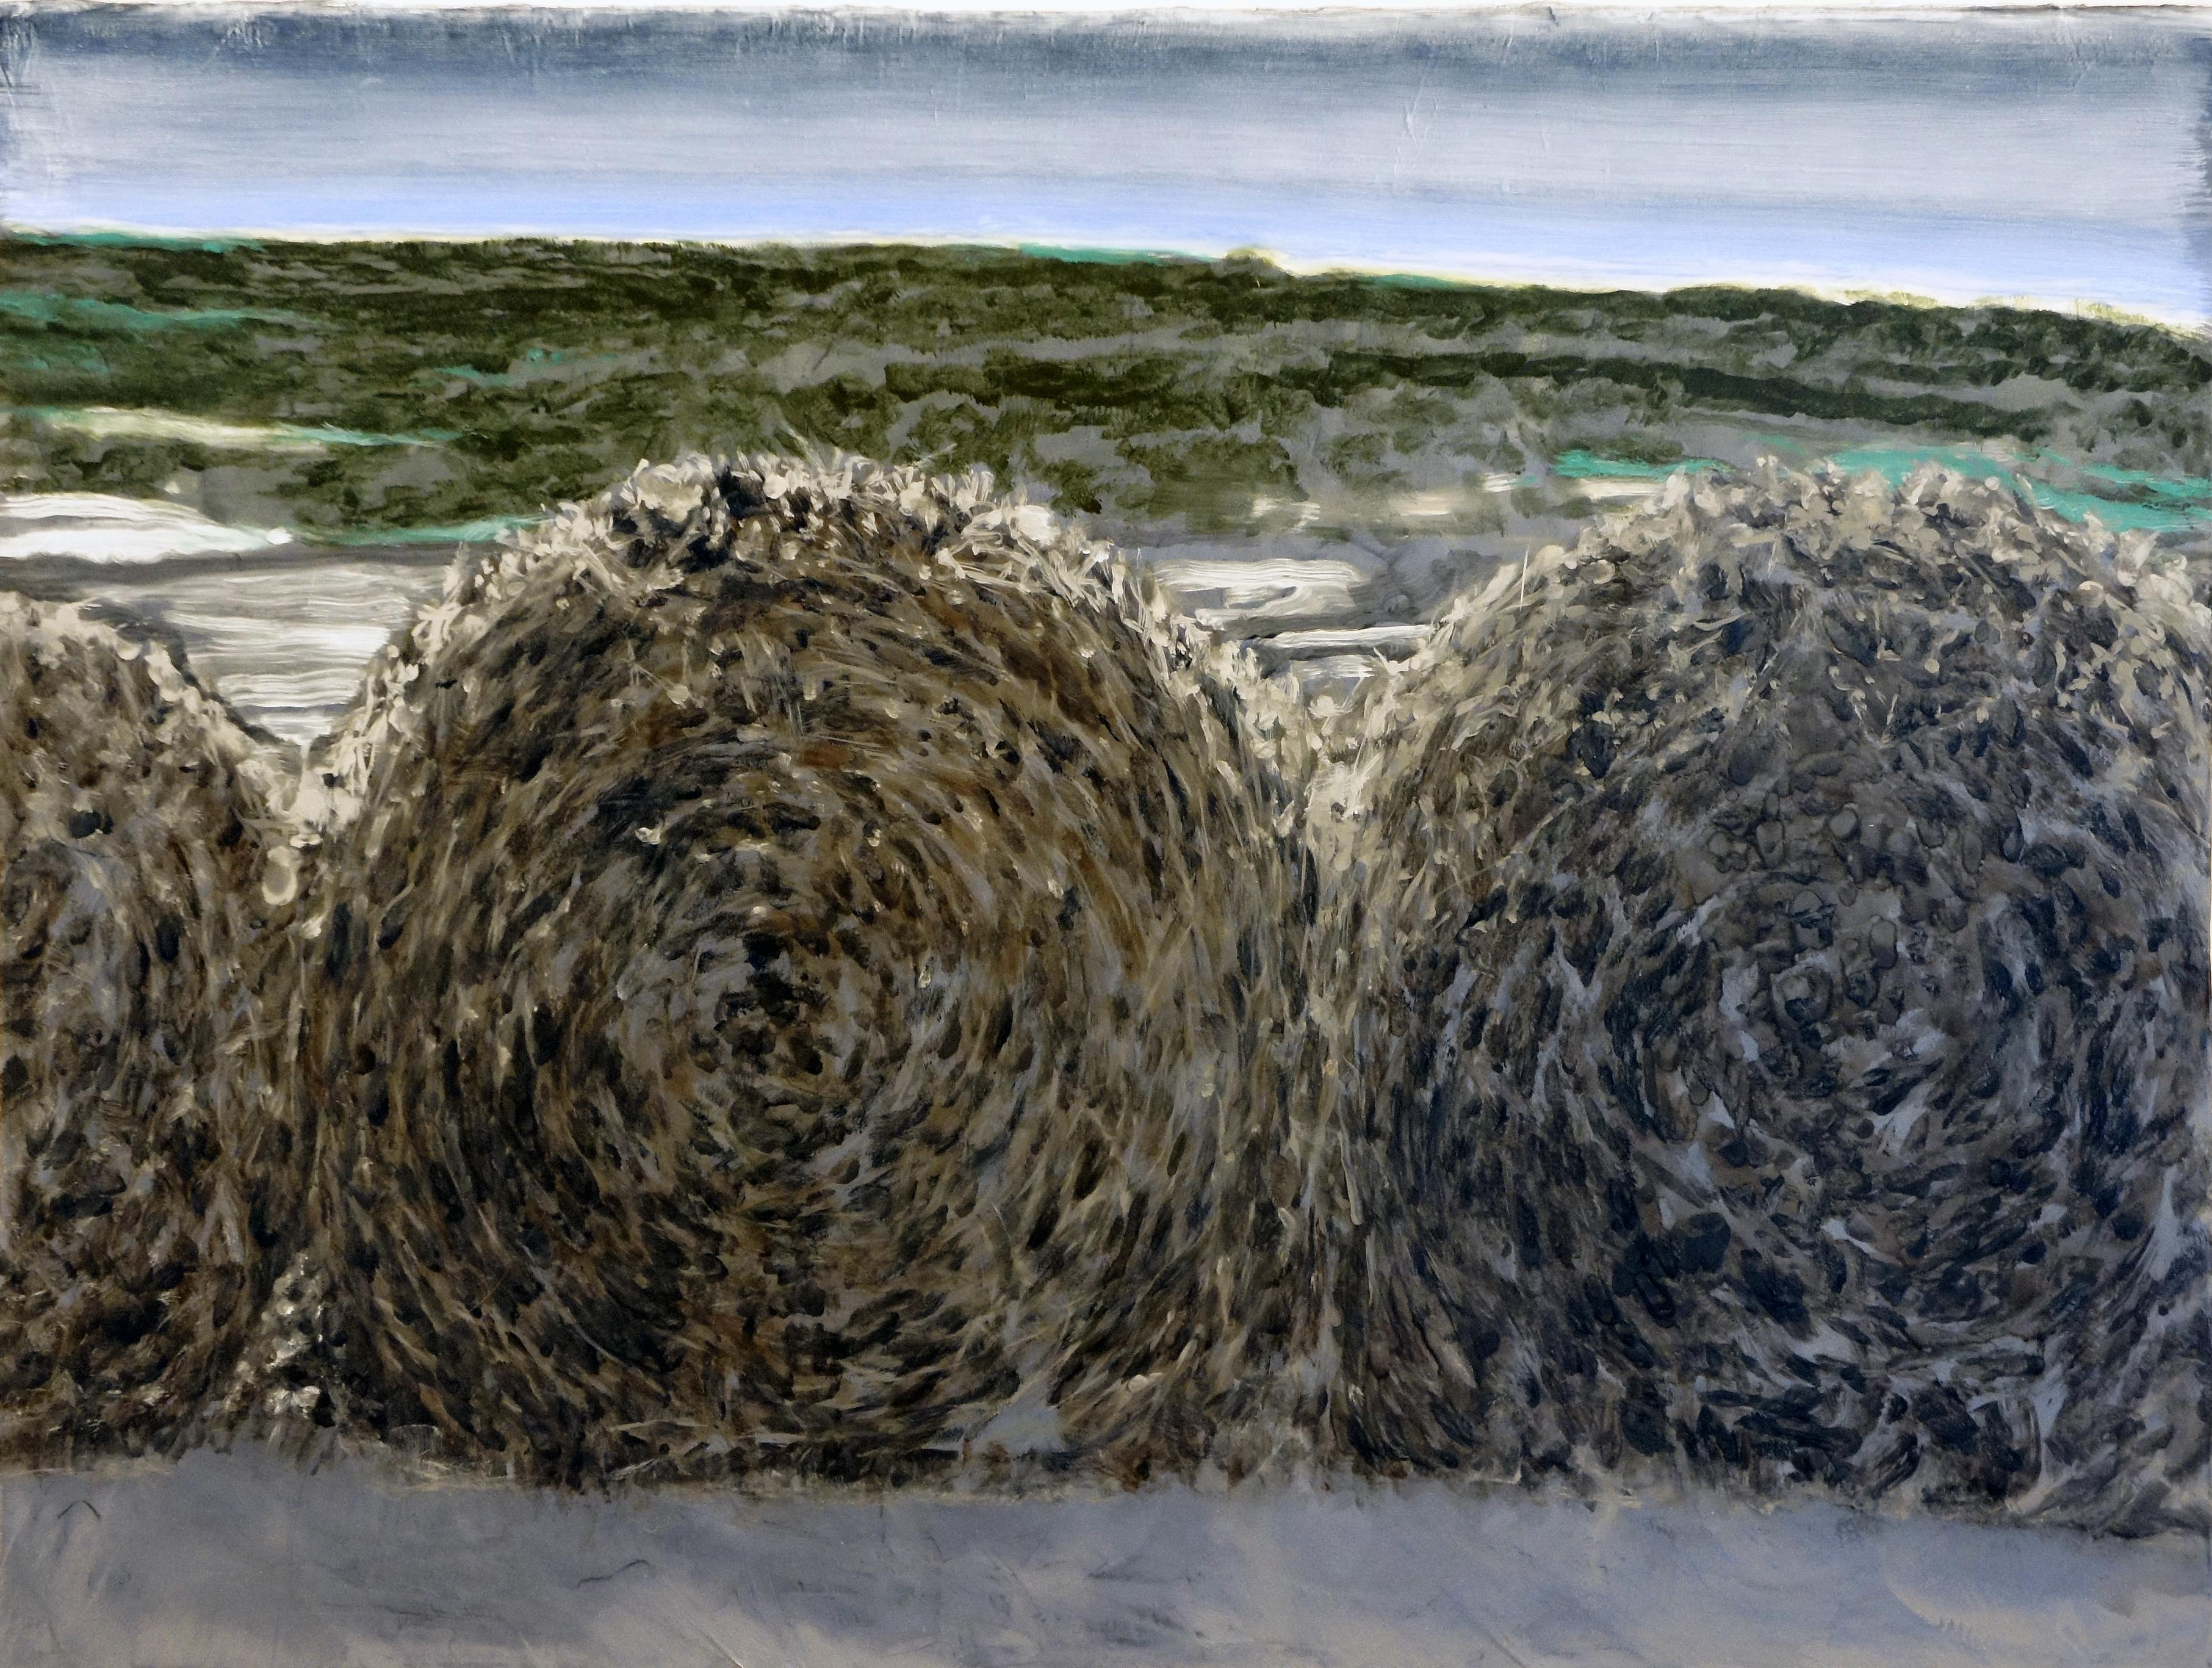 haystack at night 4